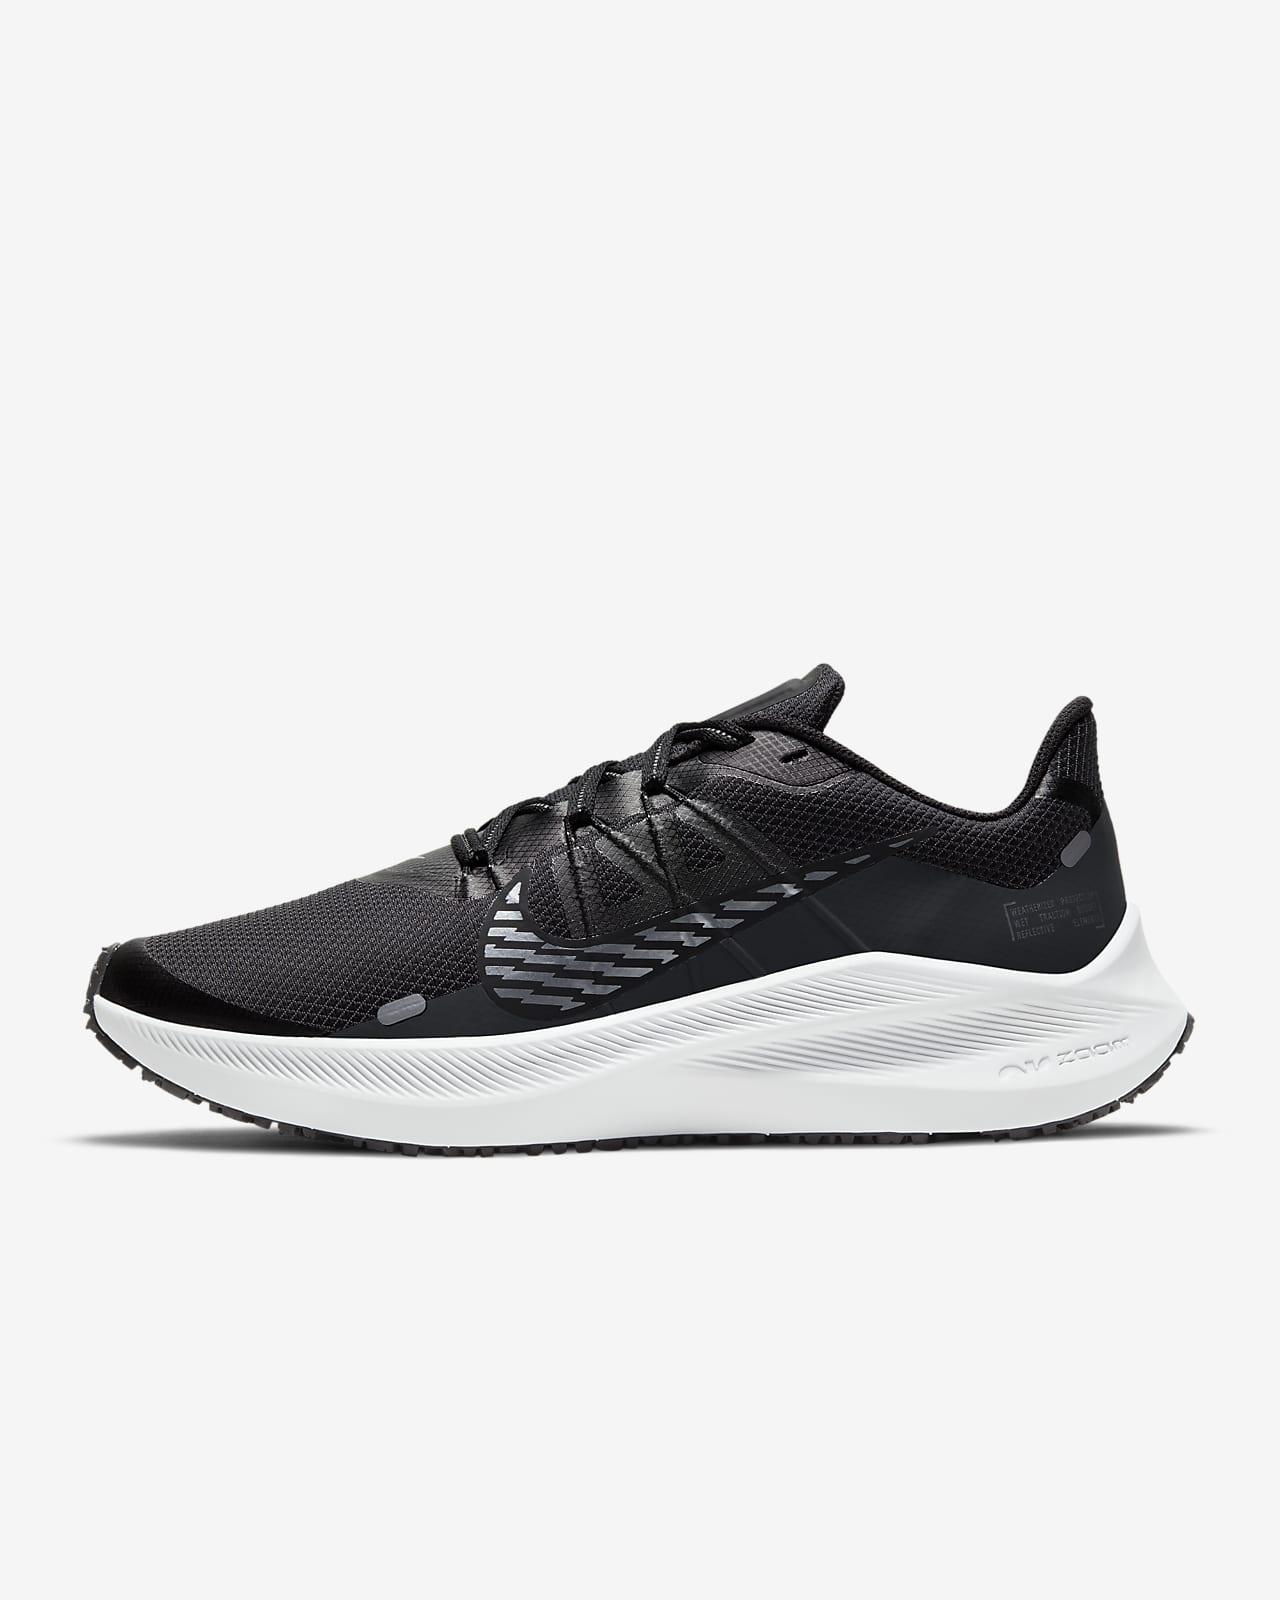 Chaussure de running Nike Winflo 7 Shield pour Femme